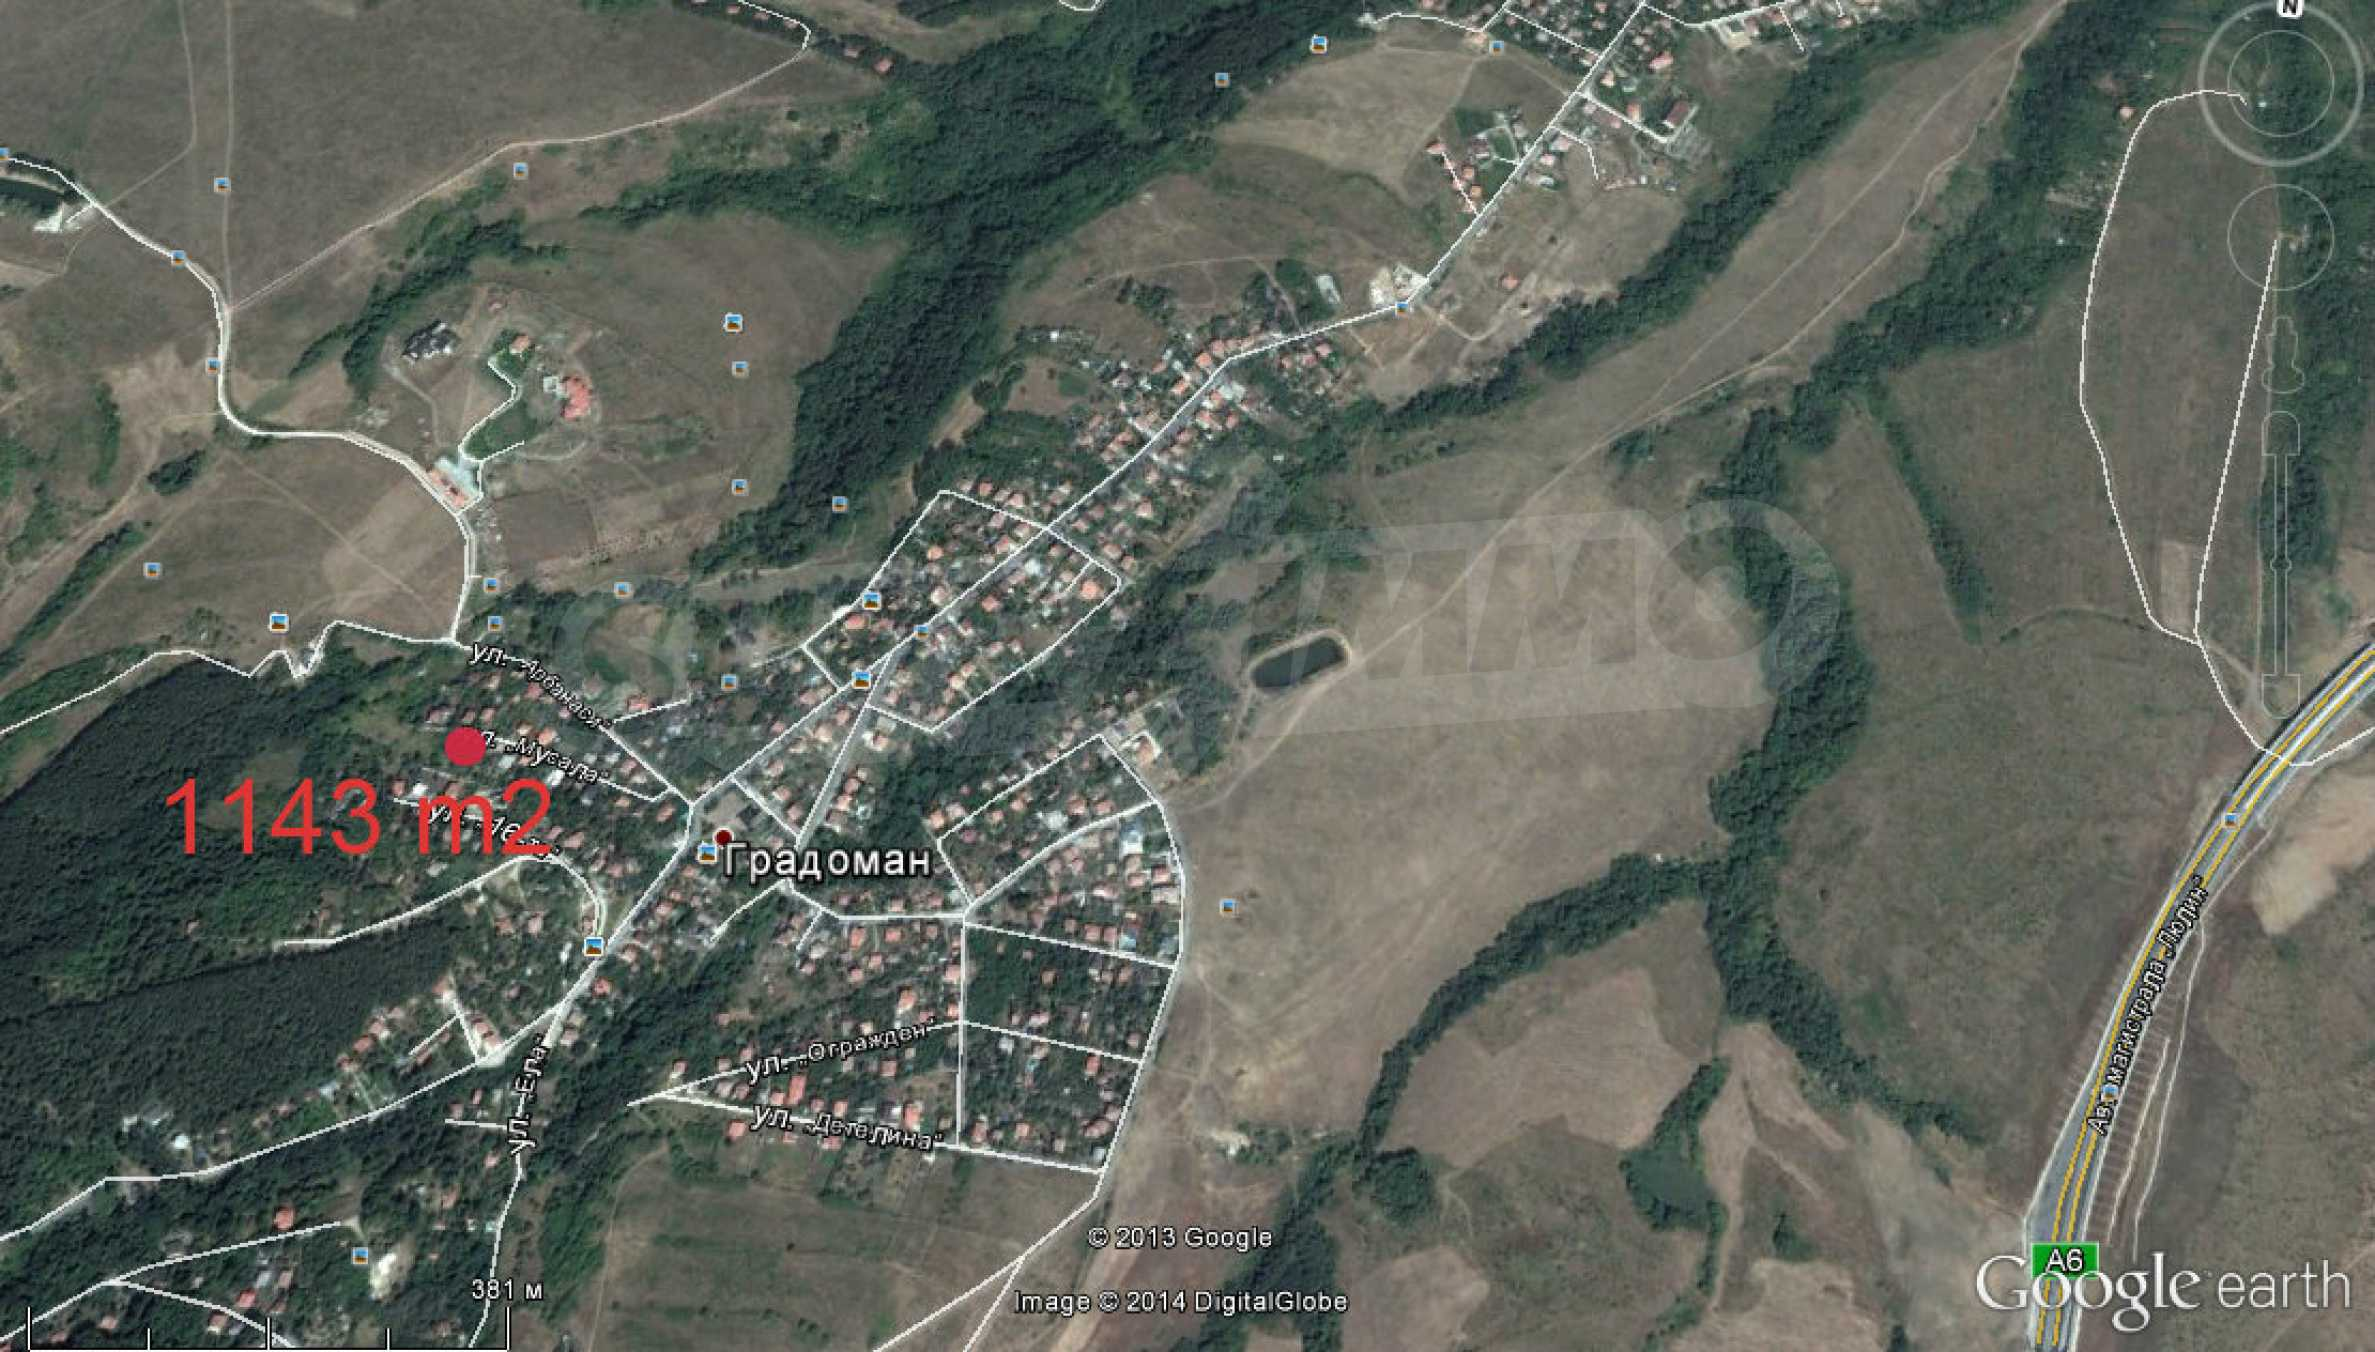 Baugrundstück zu verkaufen im Stadtteil Gradoman 1